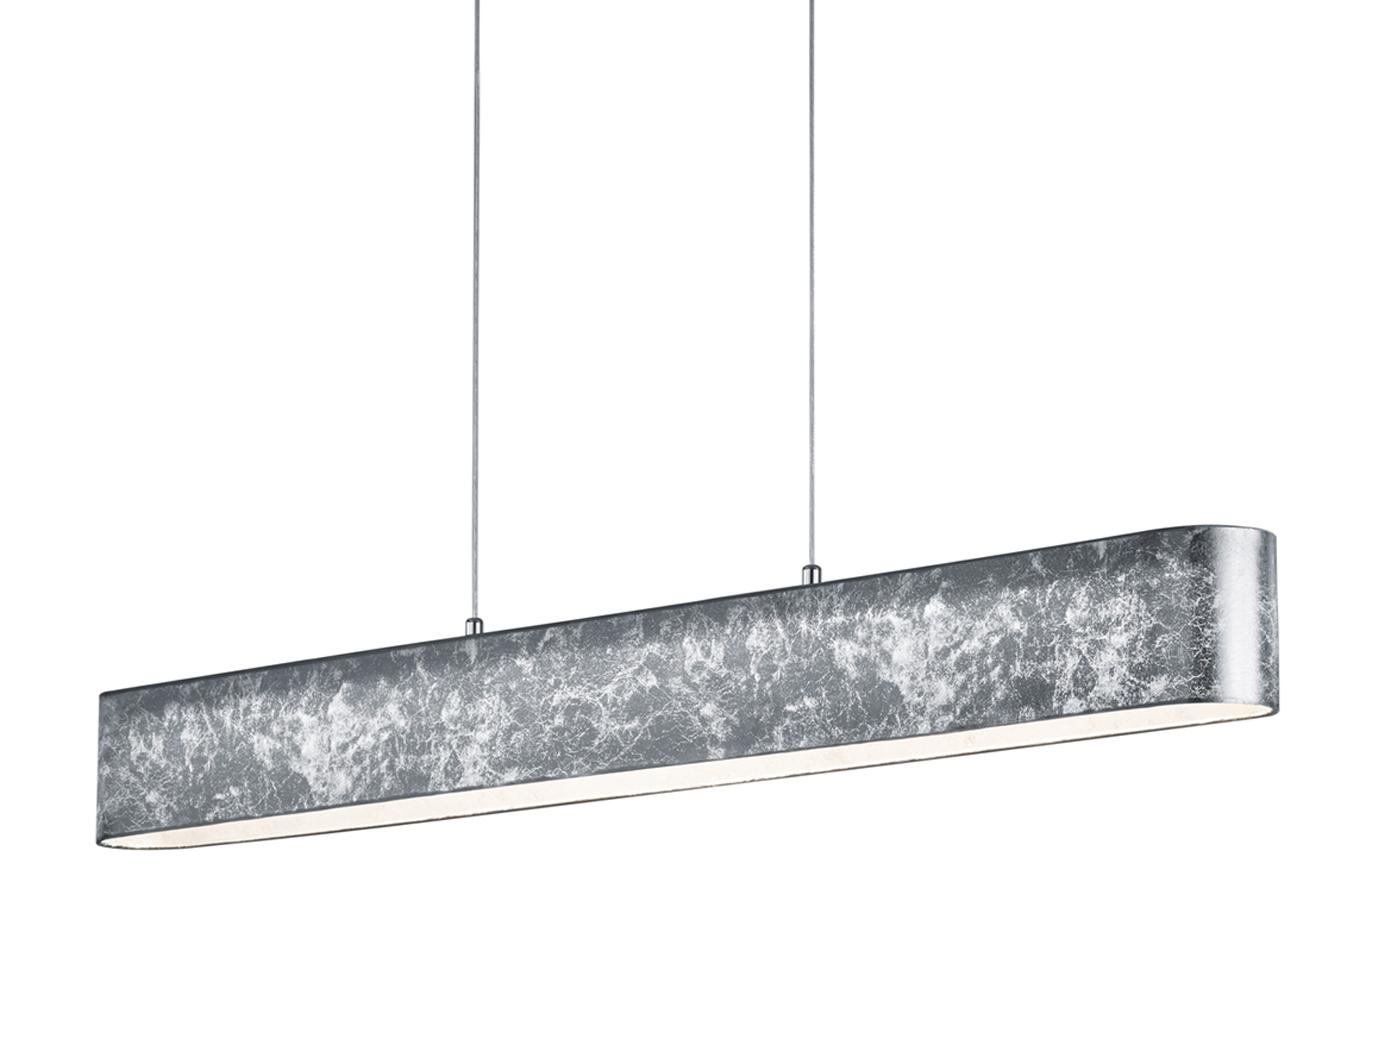 Trio LED Hängeleuchte LUGANO dimmbar Stoffschirm silber, Lampe ...